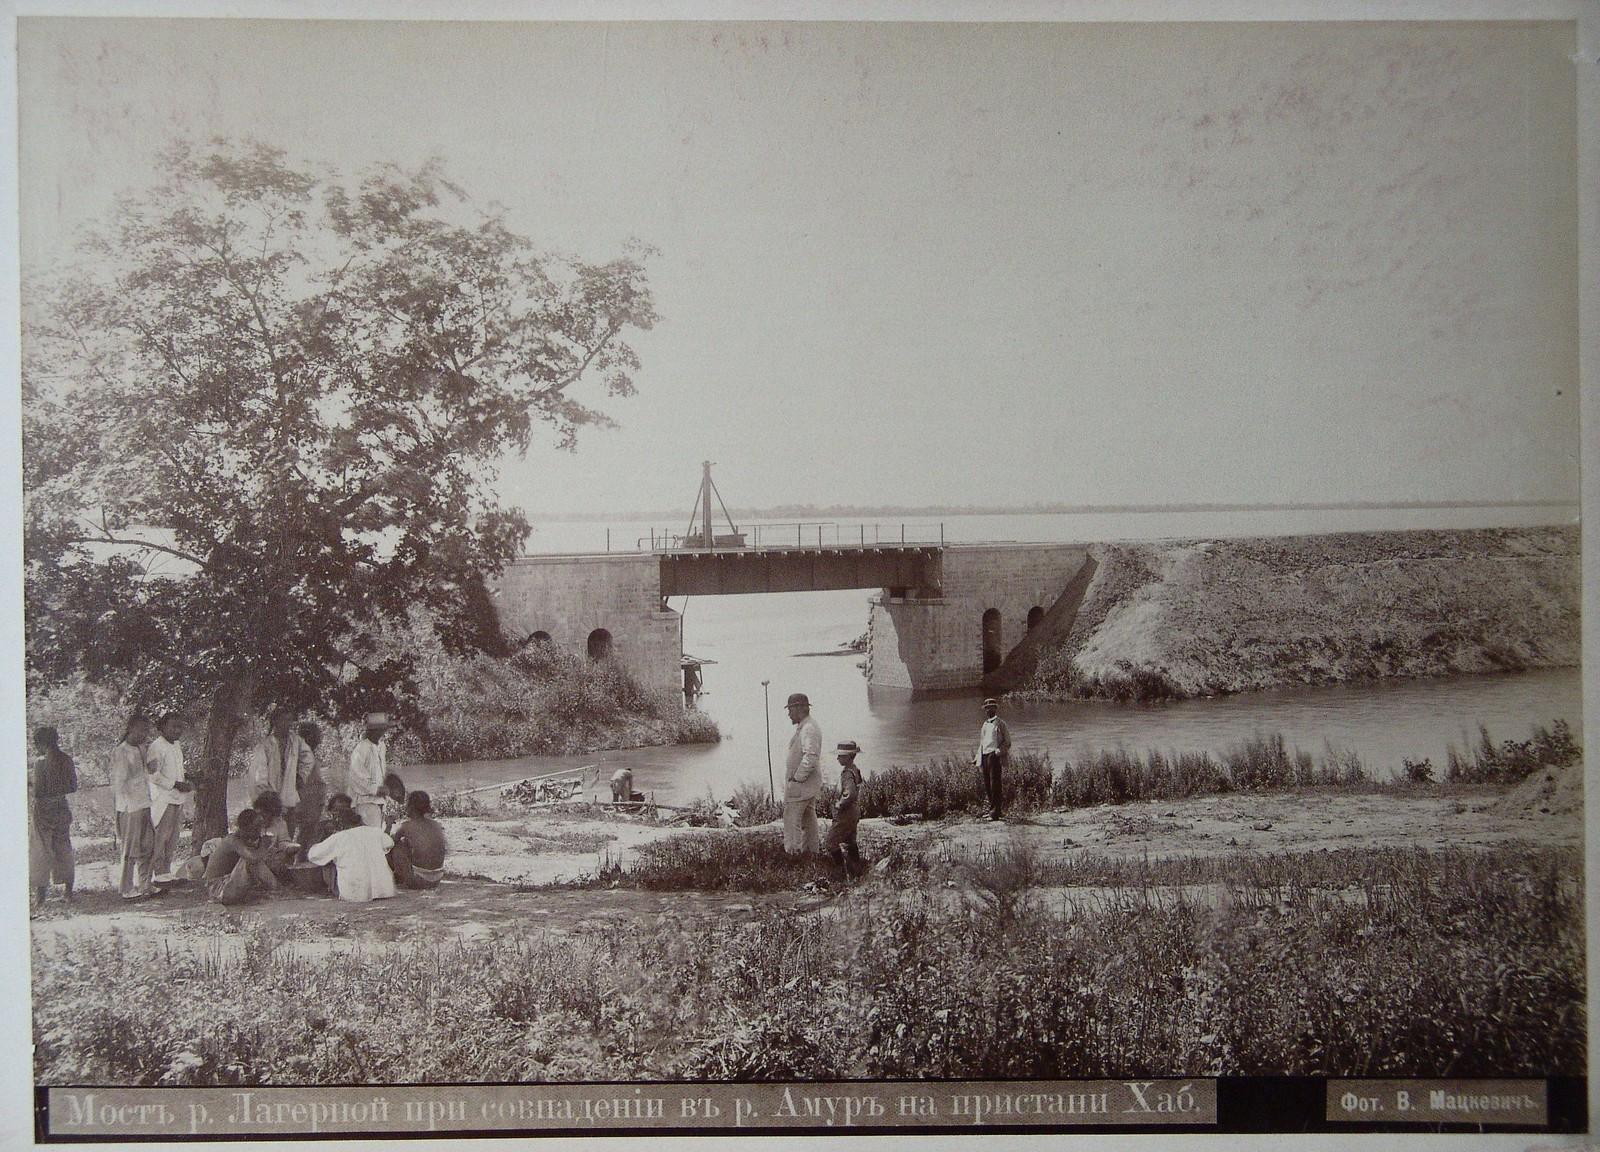 03. Мост реки Лагерной при совпадении с р. Амур на пристани